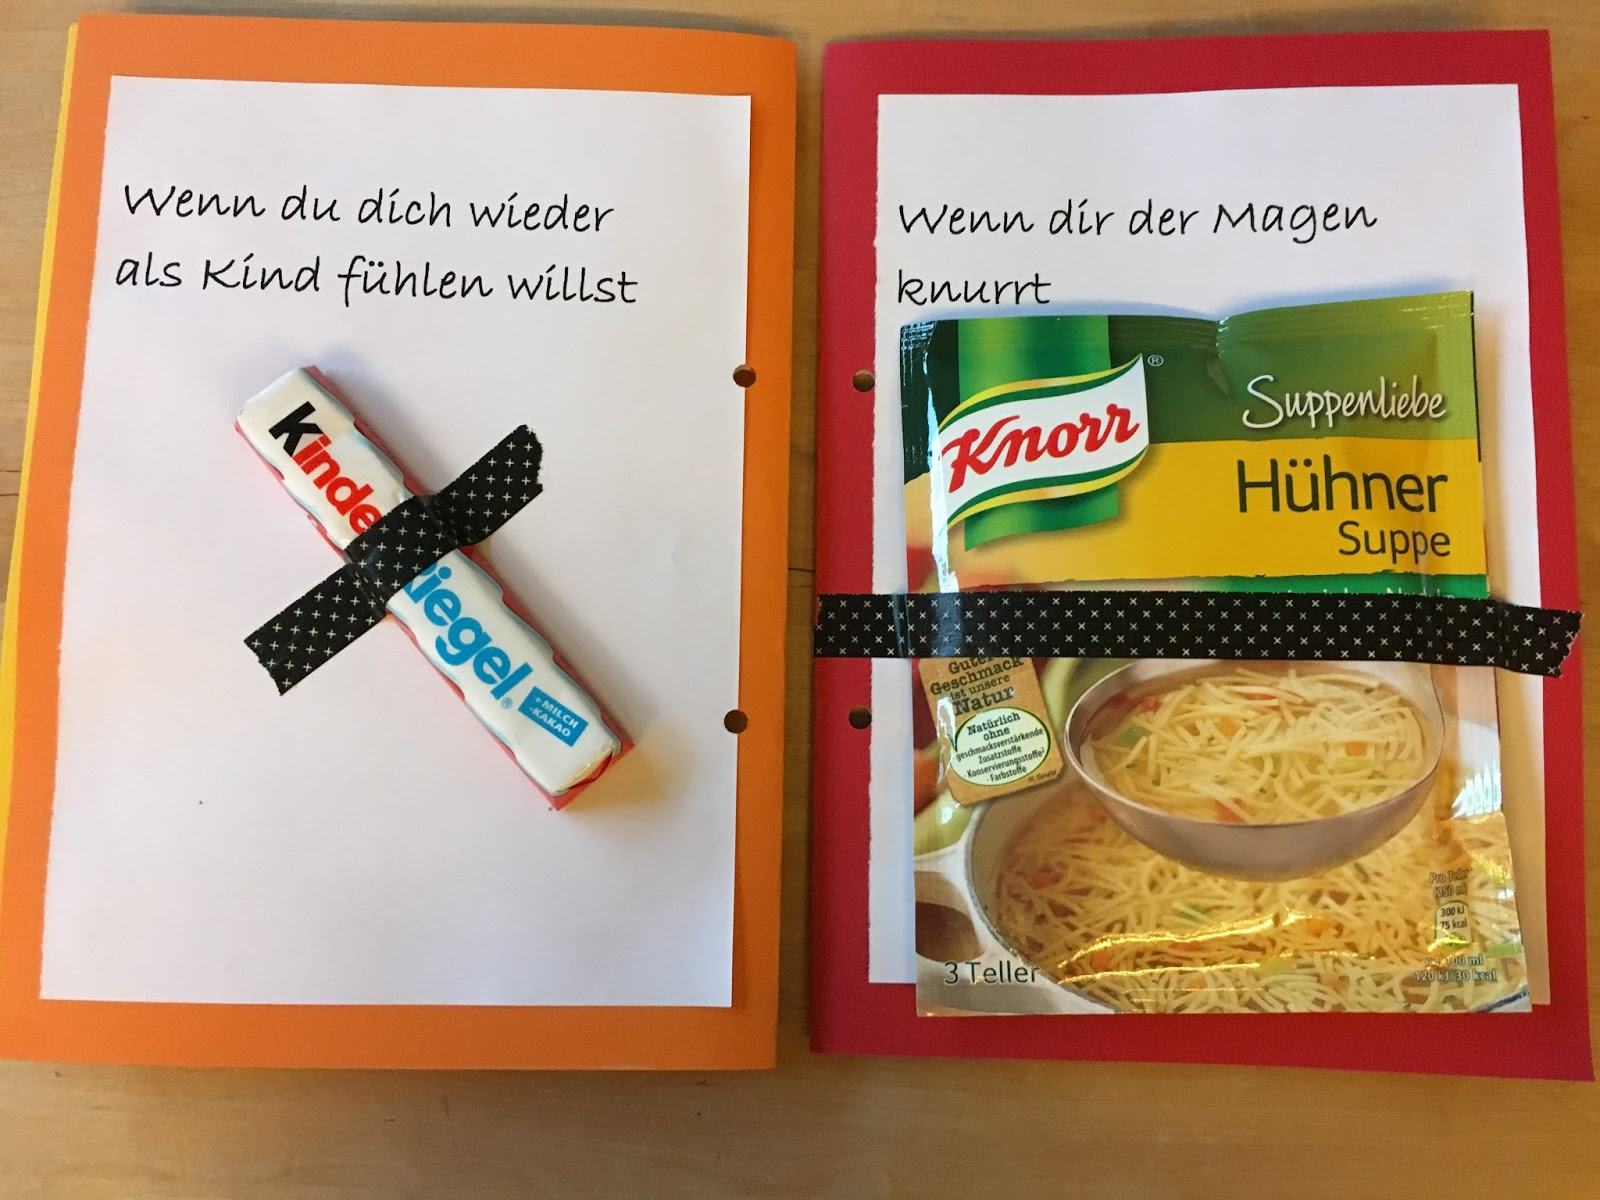 Foto Geschenk Idee : birgit schreibt geschenkidee wenn buch ~ Frokenaadalensverden.com Haus und Dekorationen